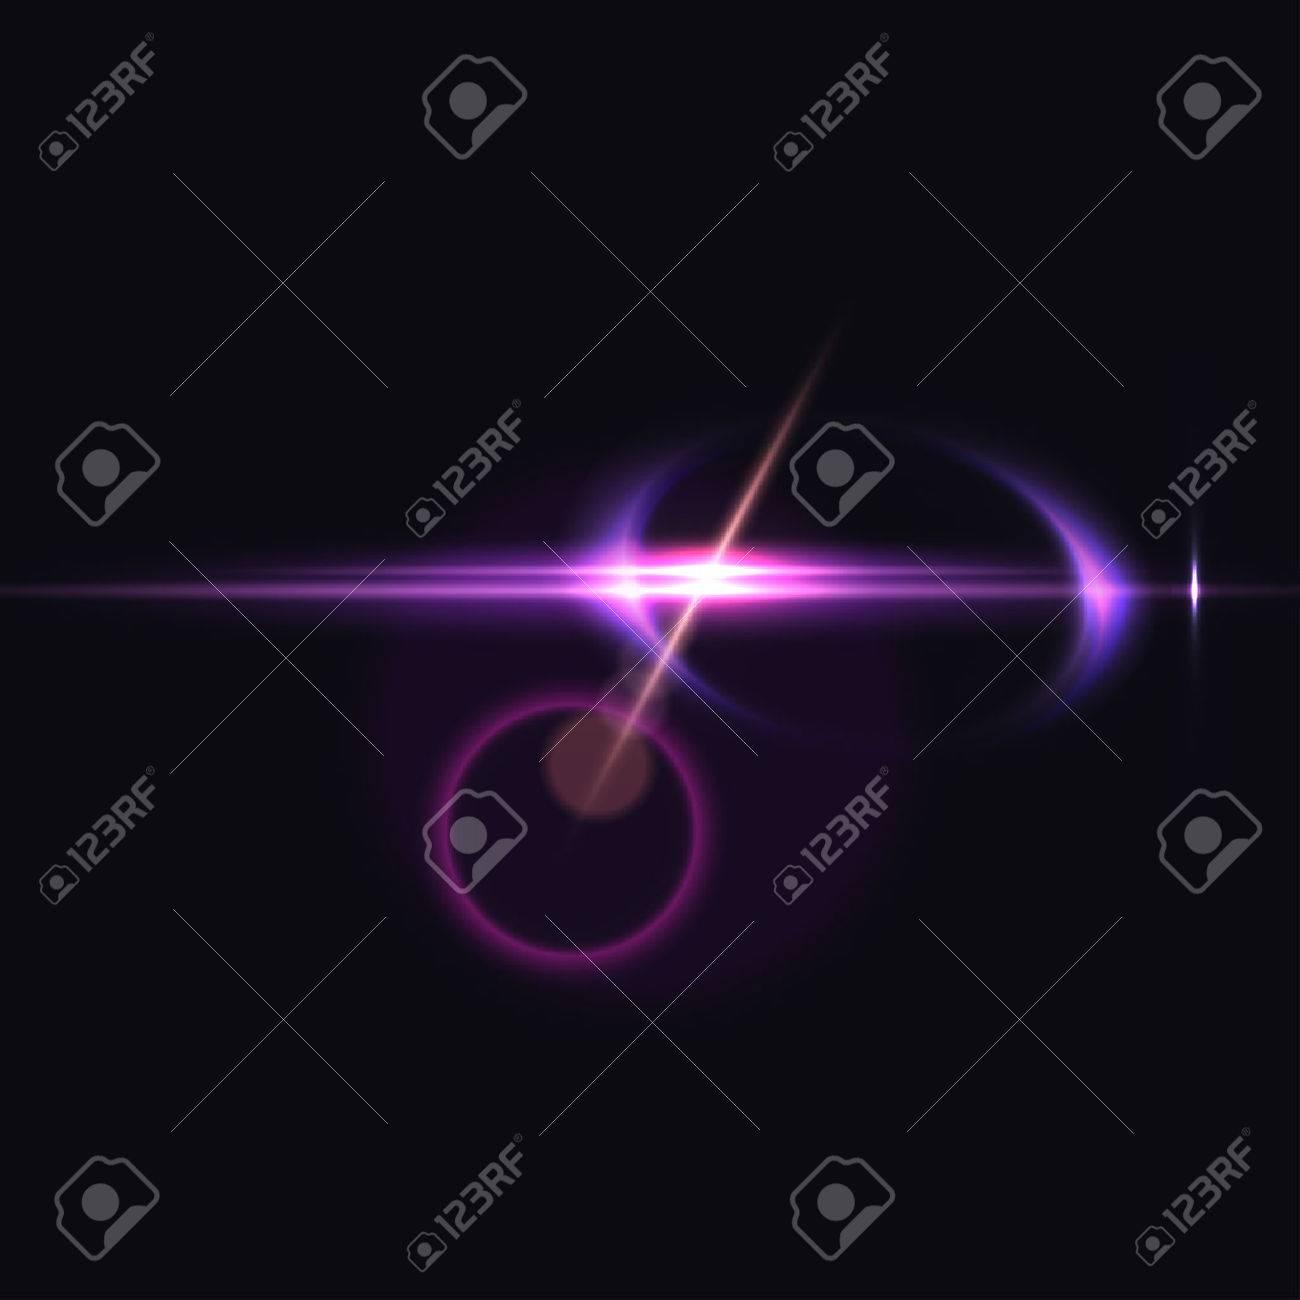 Purple Magic Outburst Simple Light Bokeh And Semi halo On Dark 1300x1300